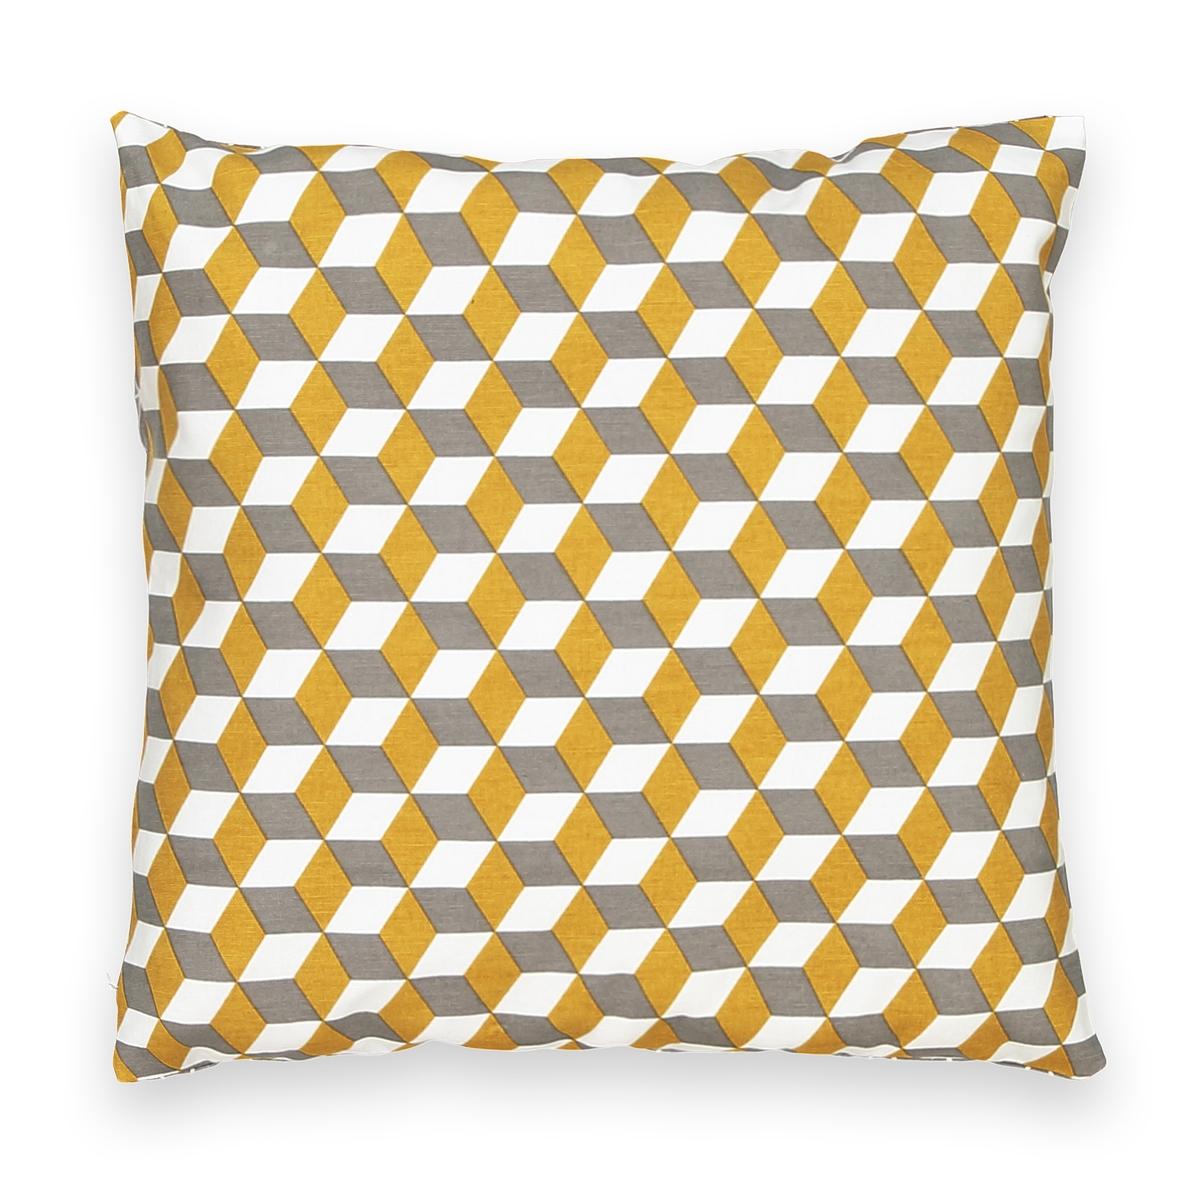 Чехол La Redoute Для подушки DECIO 40 x 40 см желтый чехол la redoute для подушки eppaloc 45 x 45 см оранжевый